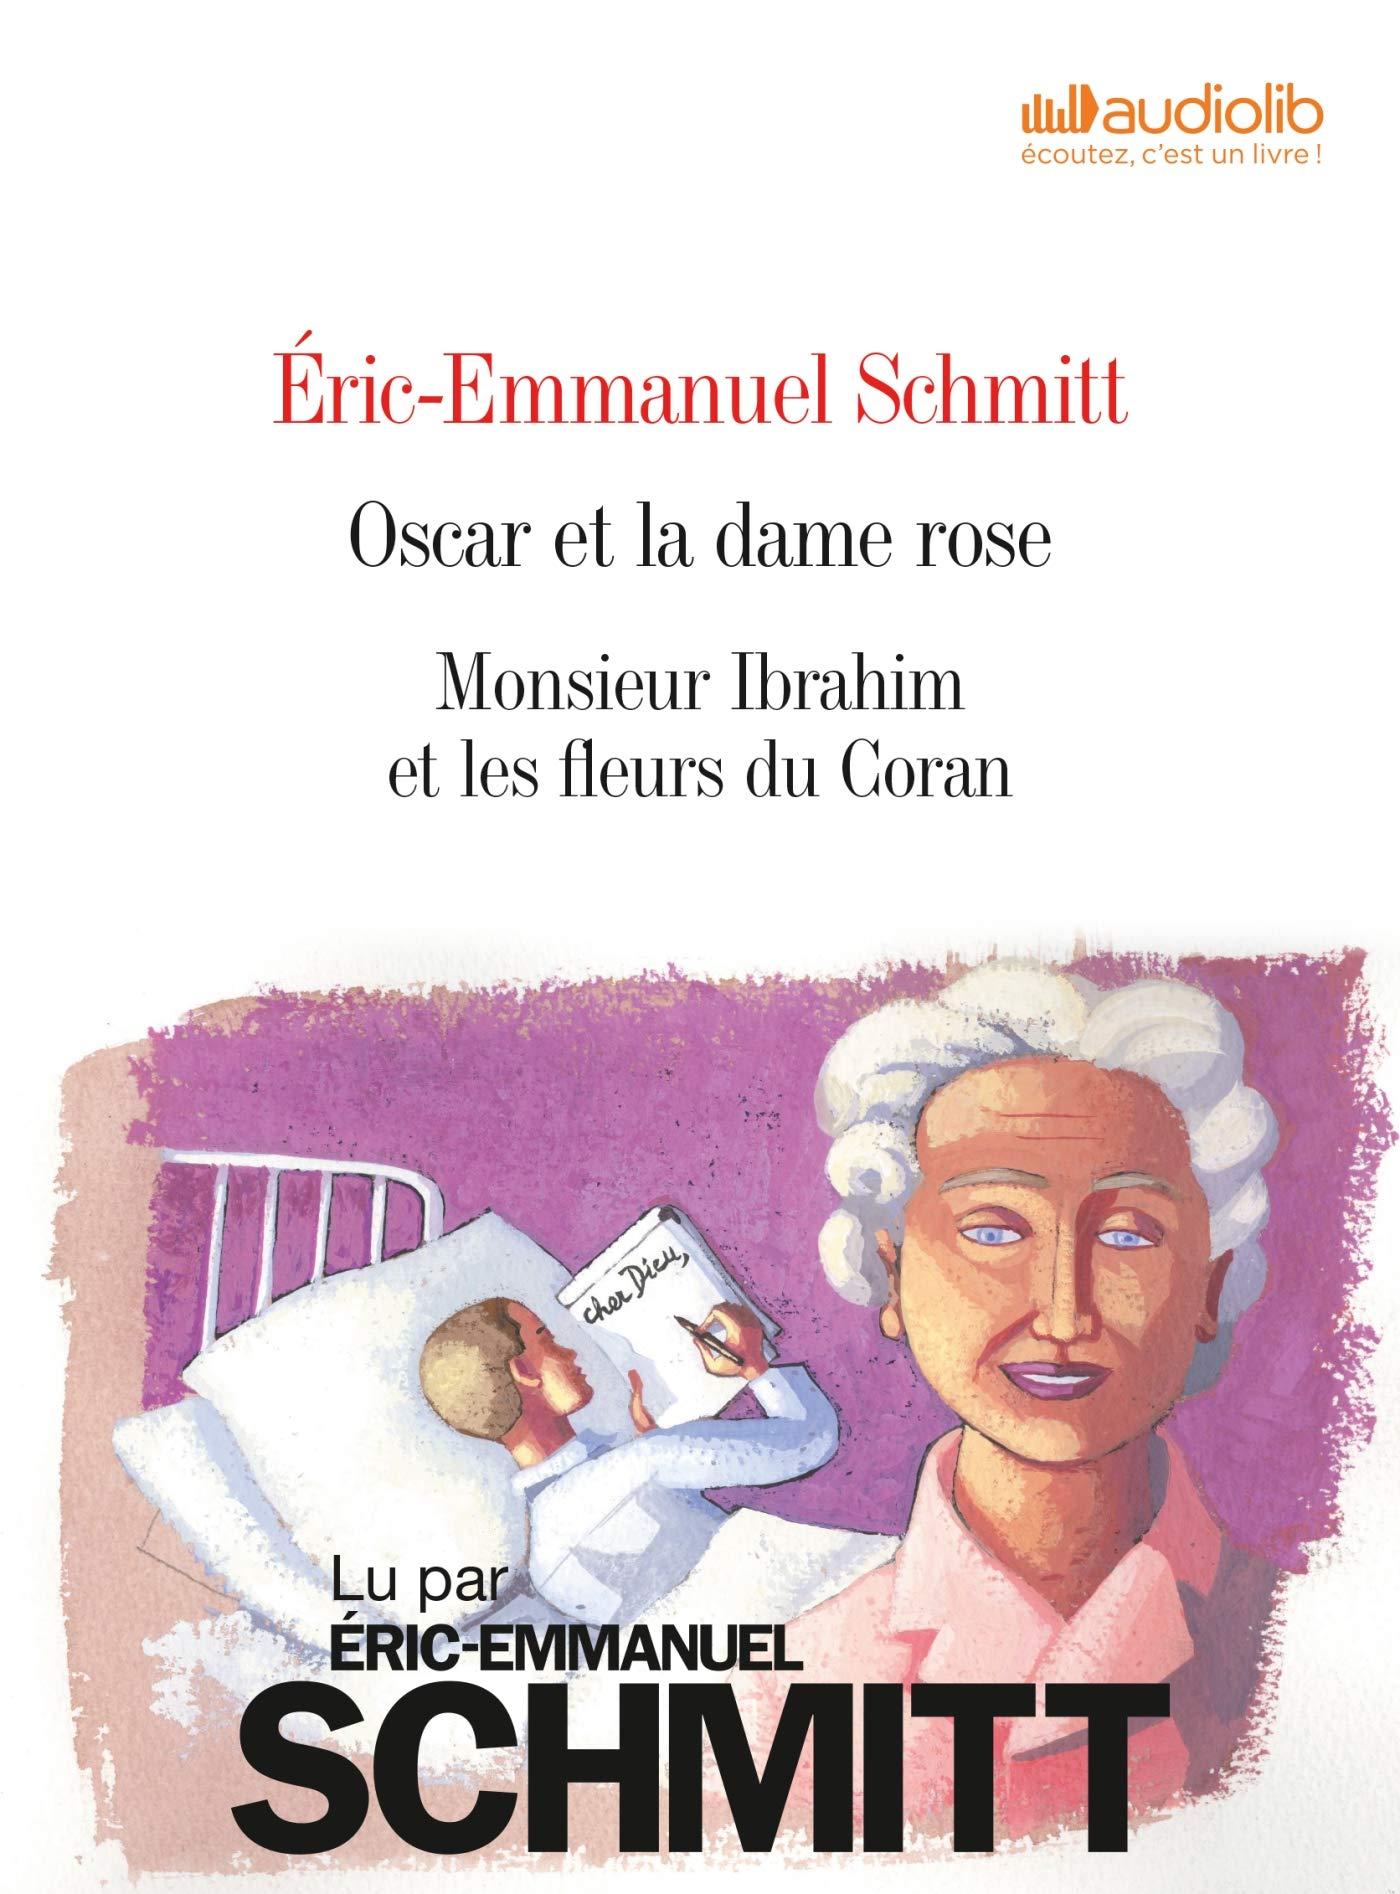 Eric Emmanuel Schmitt Oscar Et La Dame Rose Monsieur Ibrahim Coffret 2 Cd Livre Audio 2 Cd Mp3 Le Cycle De L Invisible Oscar Et La Dame Rose Monsieur Ibrahim French